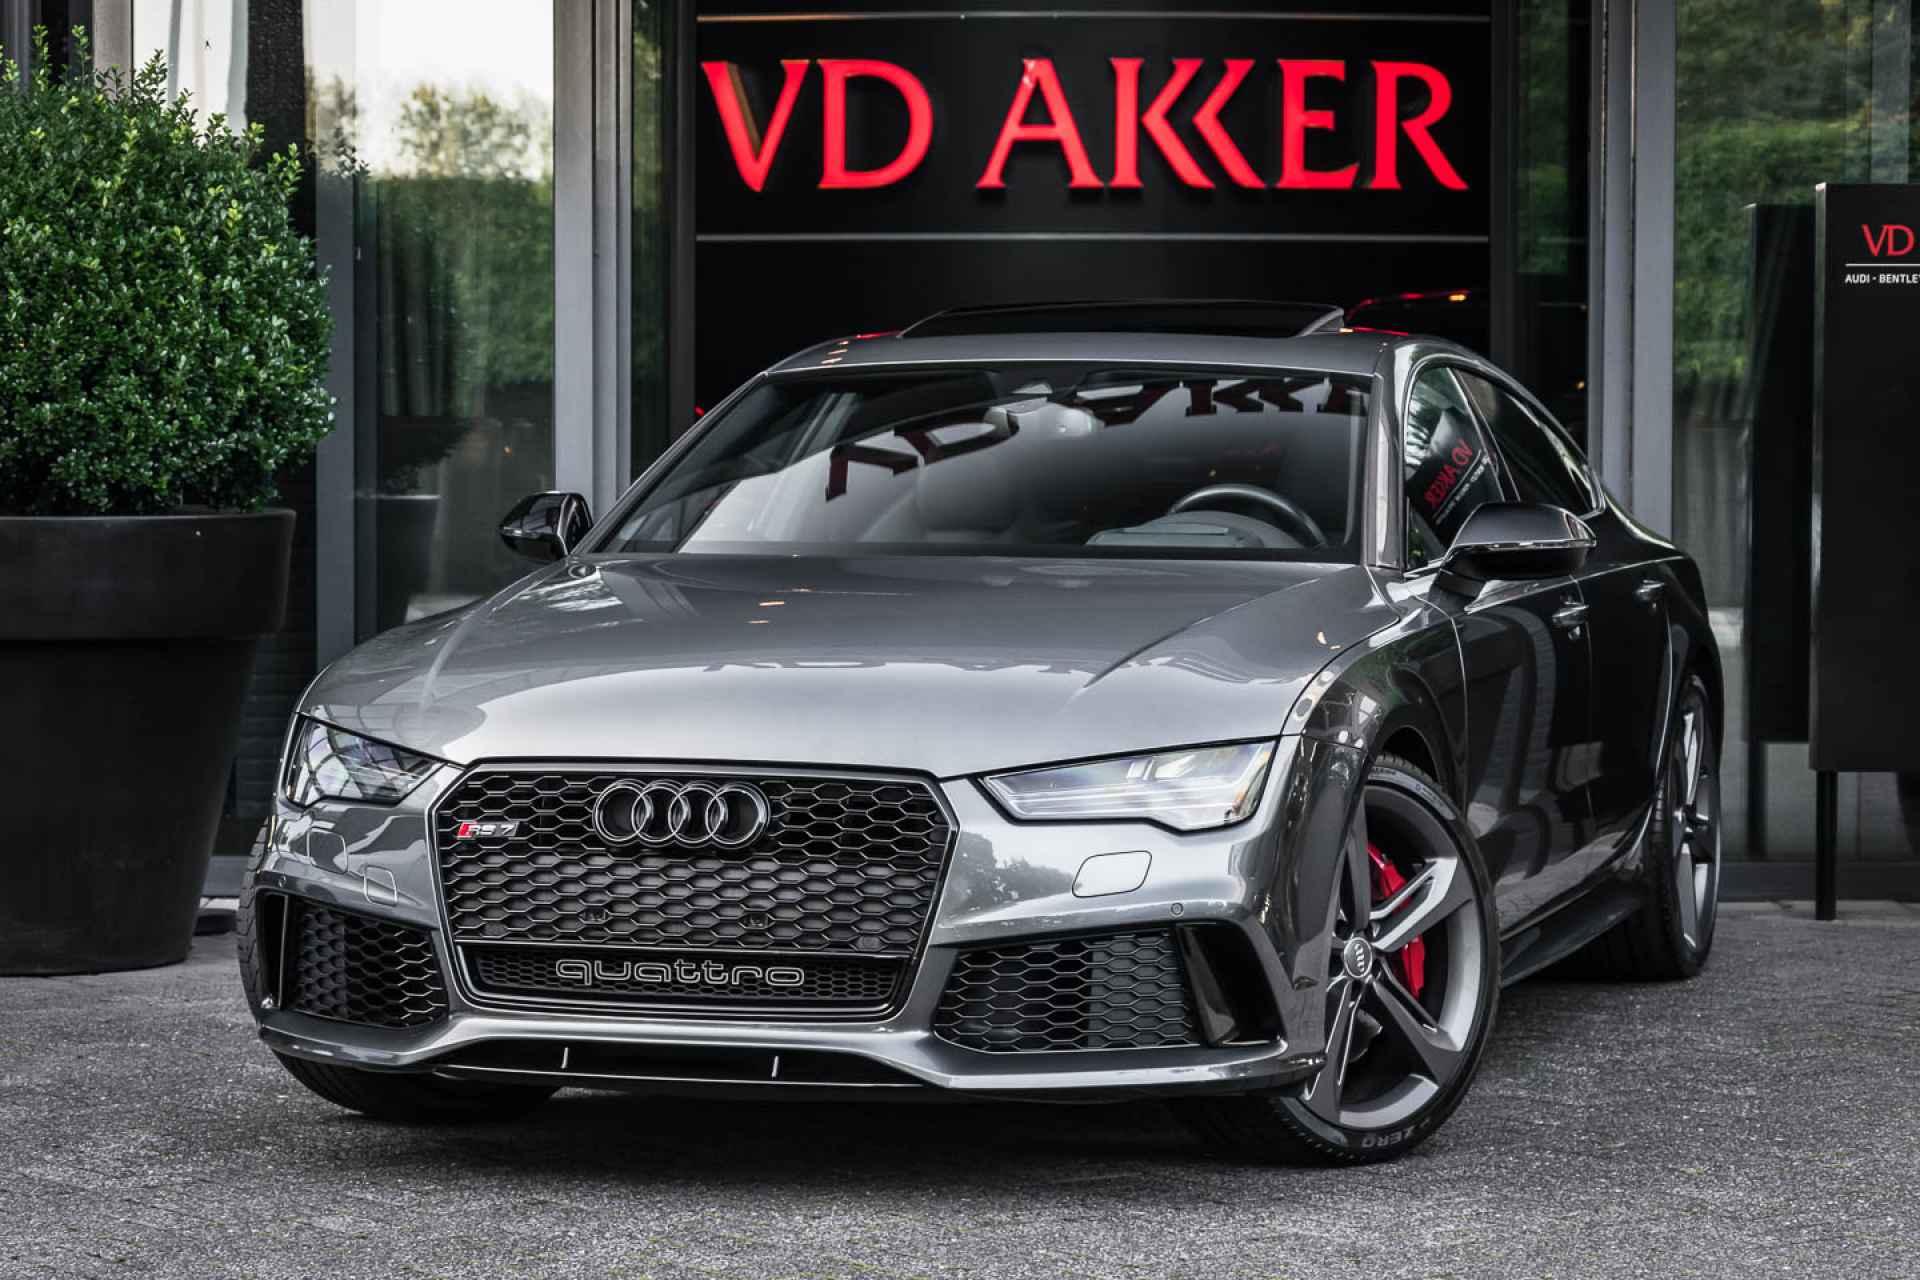 Tweedehands Audi RS7 Sportback occasion